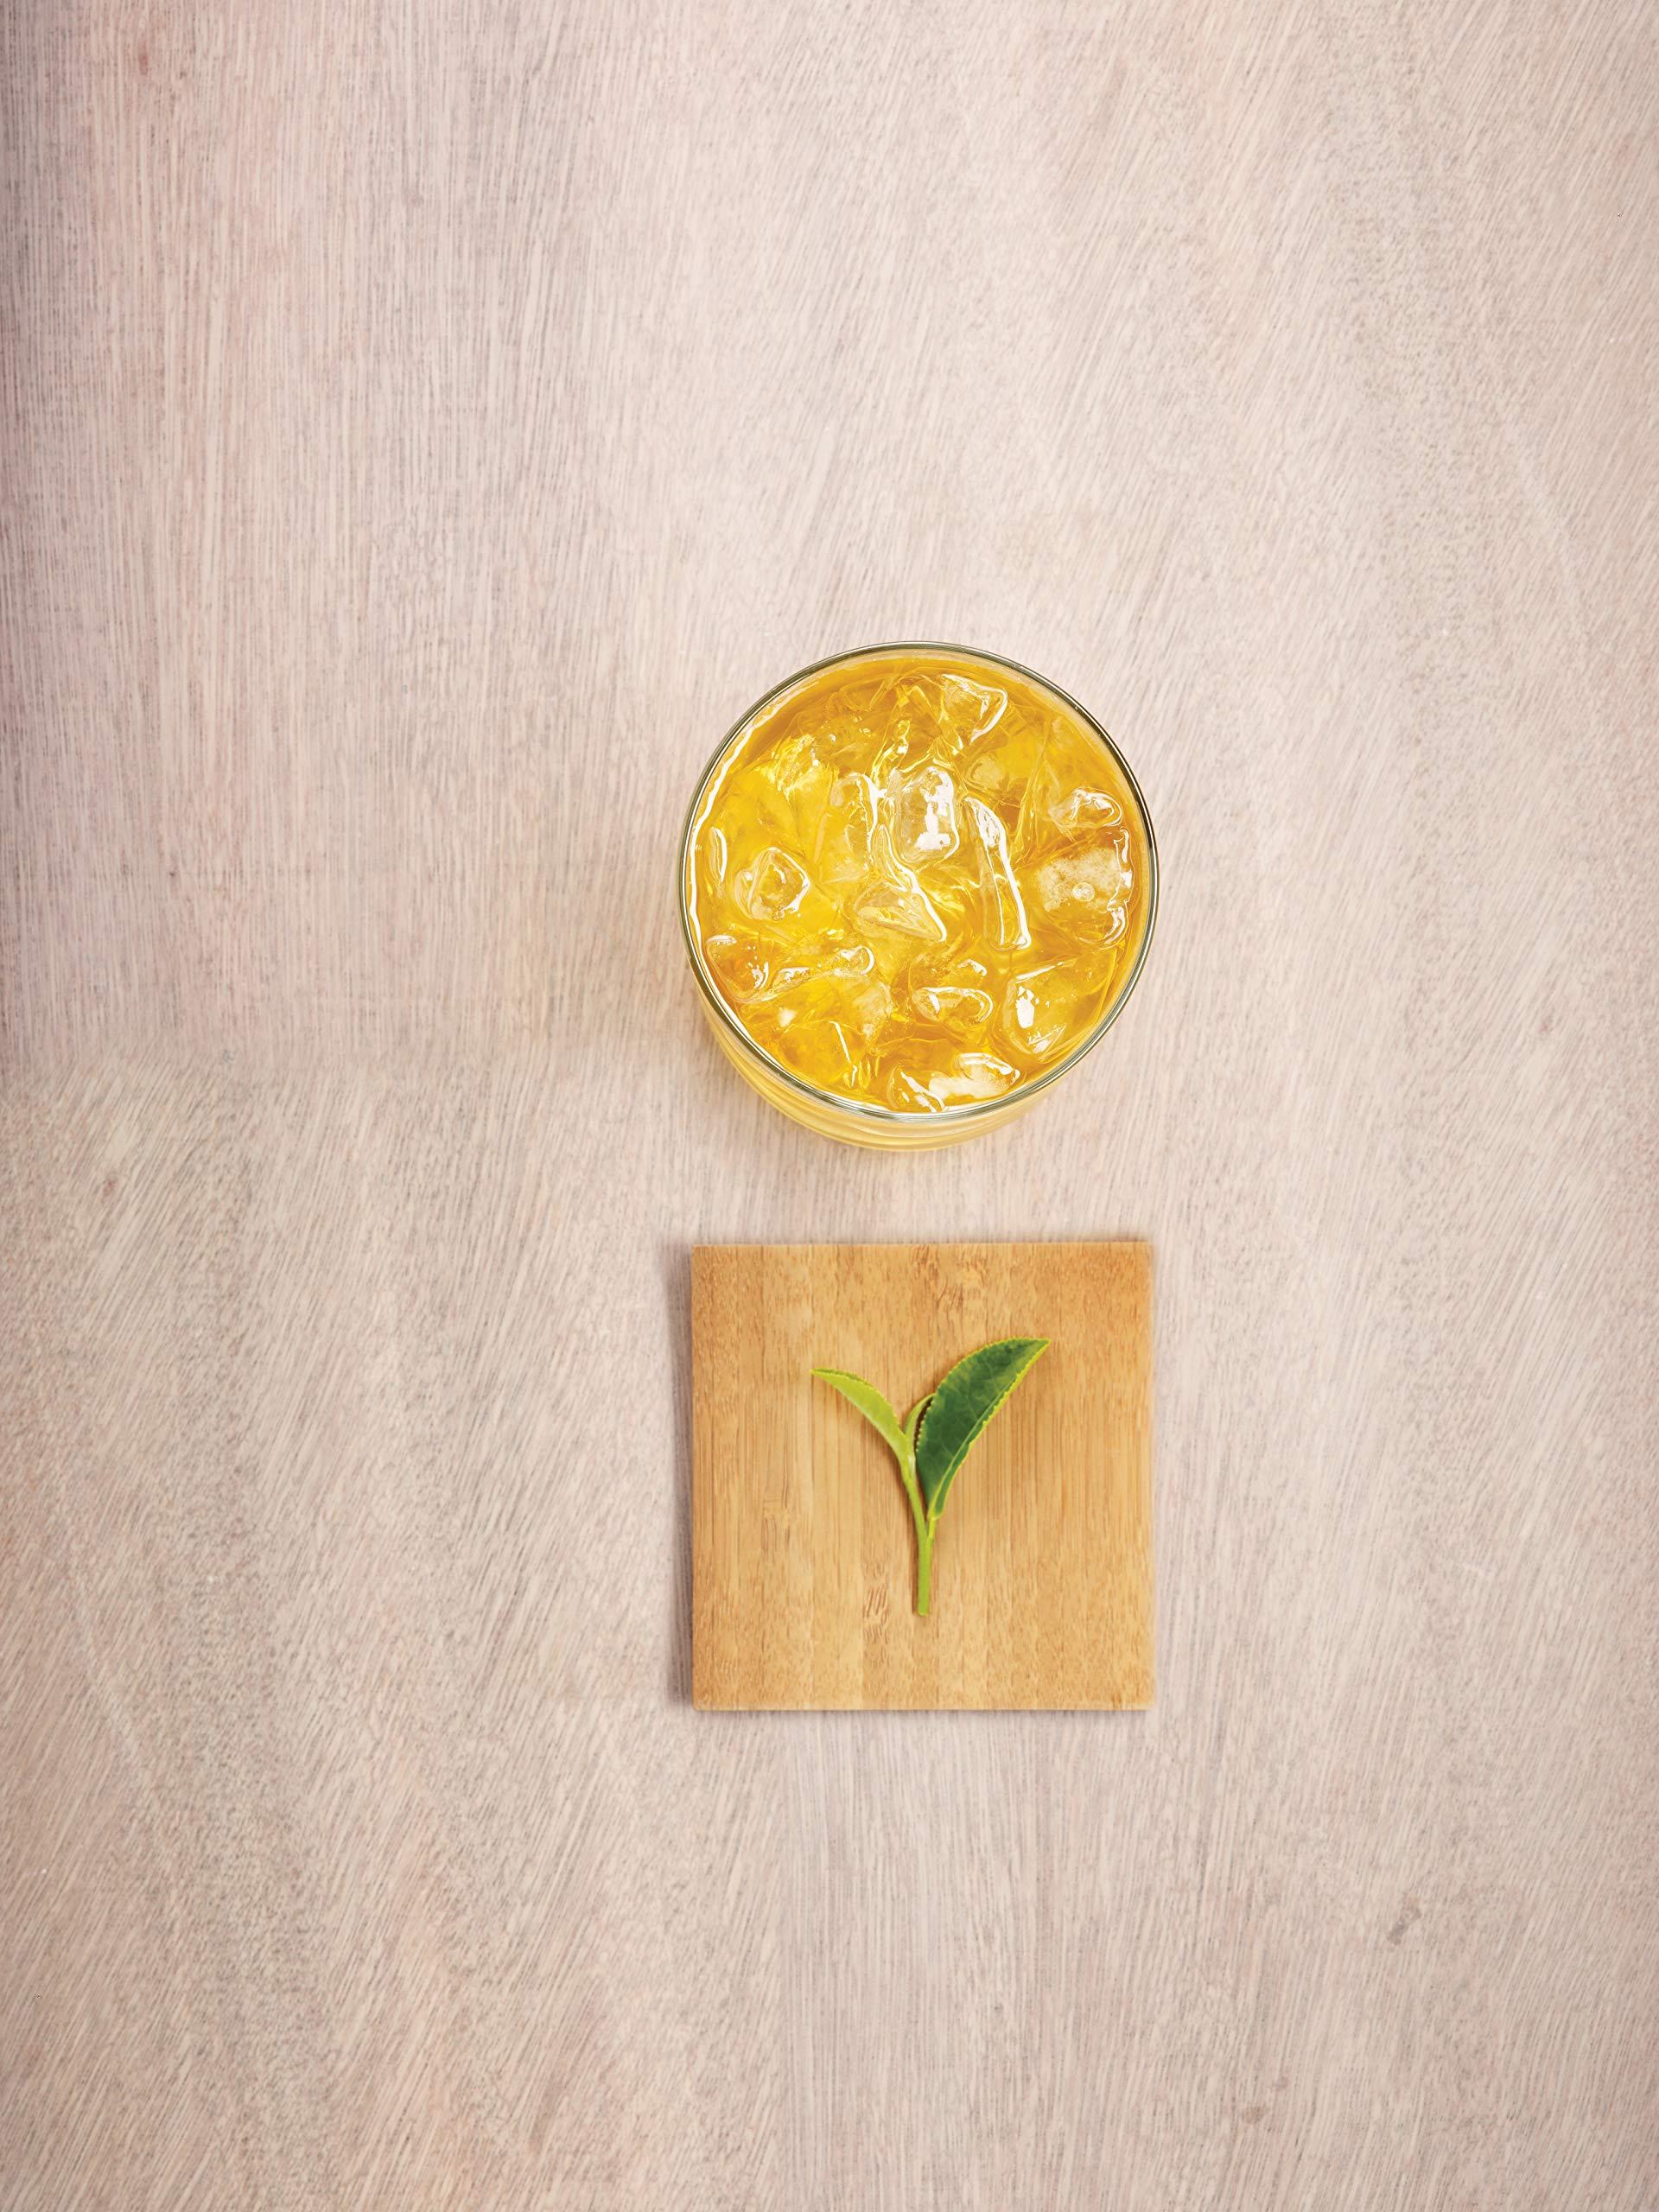 Tazo Zen Green Unsweetened Fresh Brewed Iced Tea Non GMO, 1 gallon, Pack of 24 by TAZO (Image #6)